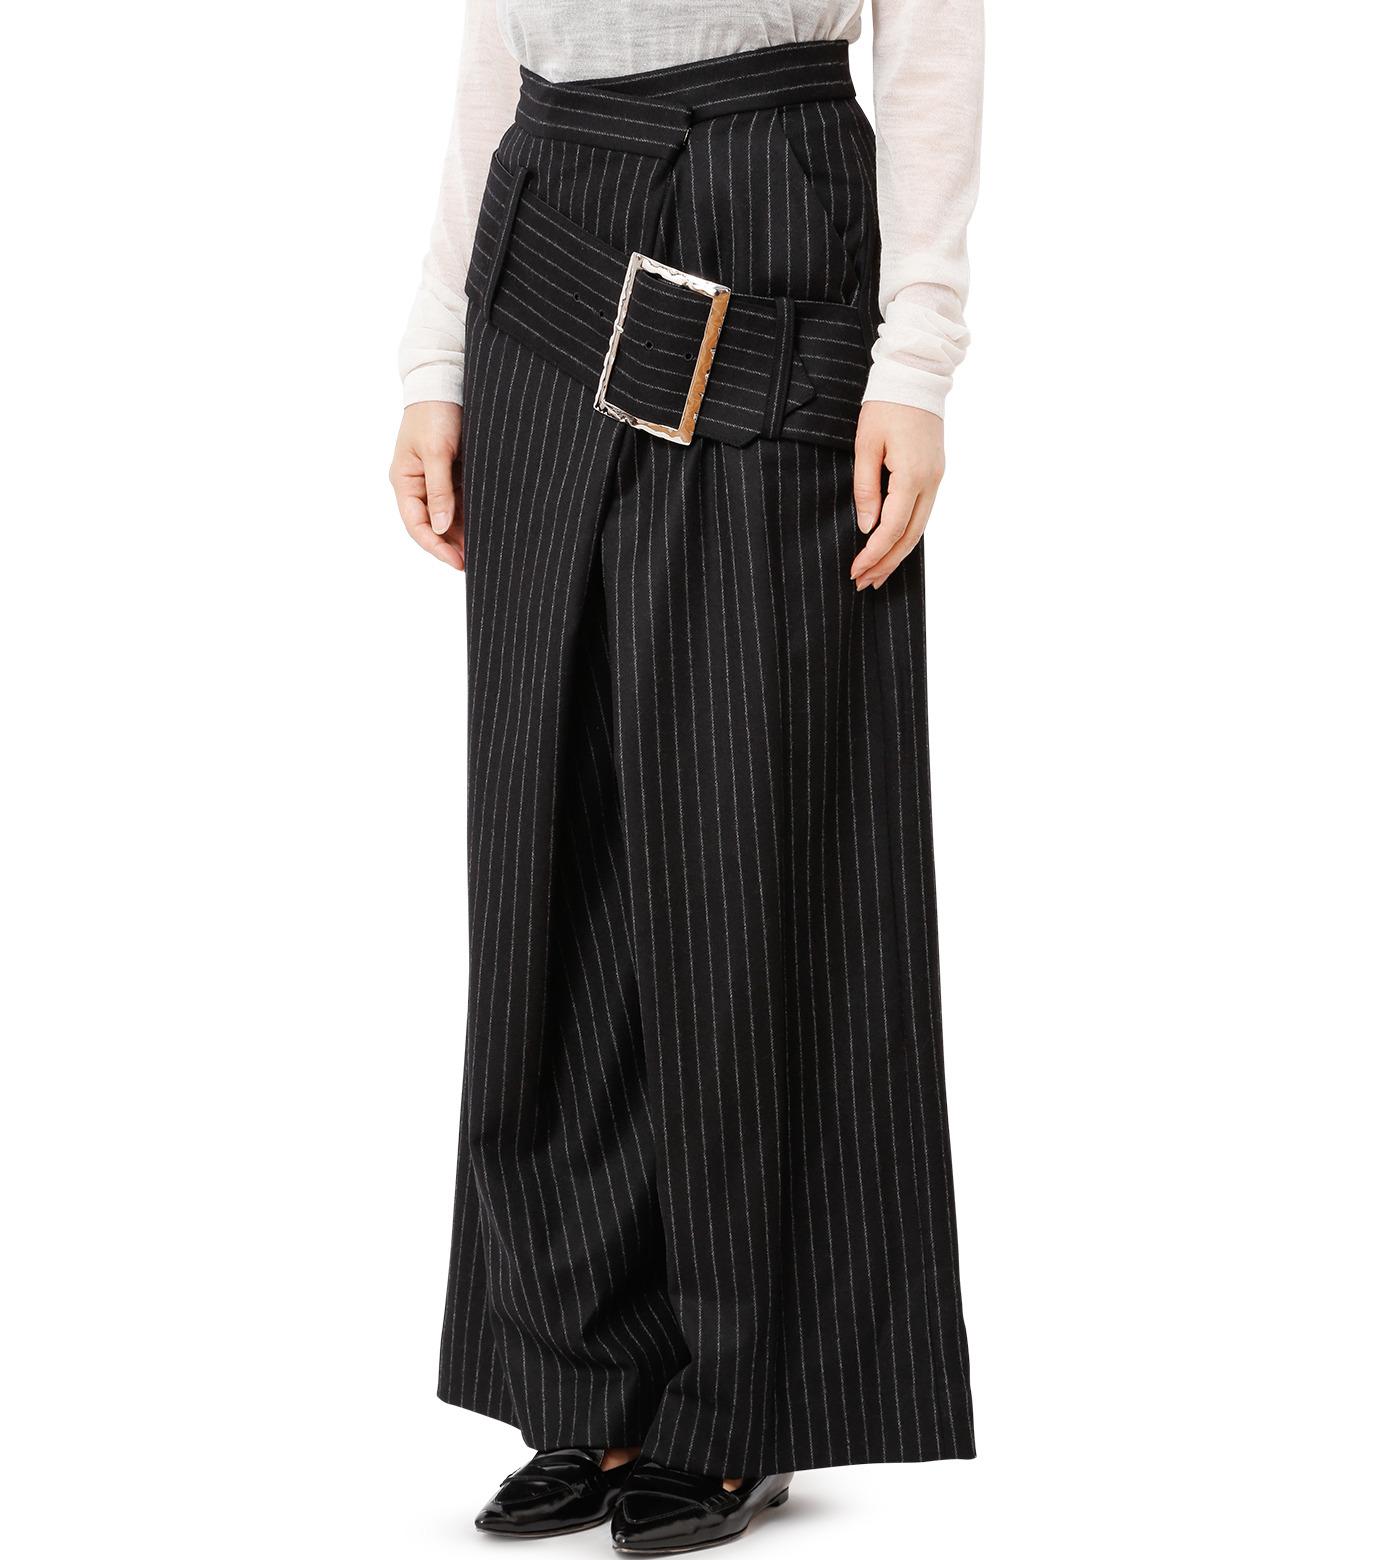 CHRISTIAN DADA(クリスチャン ダダ)のStriped Wideleg Trouser w/Buckle-BLACK(パンツ/pants)-16W-D-0607-13 拡大詳細画像1